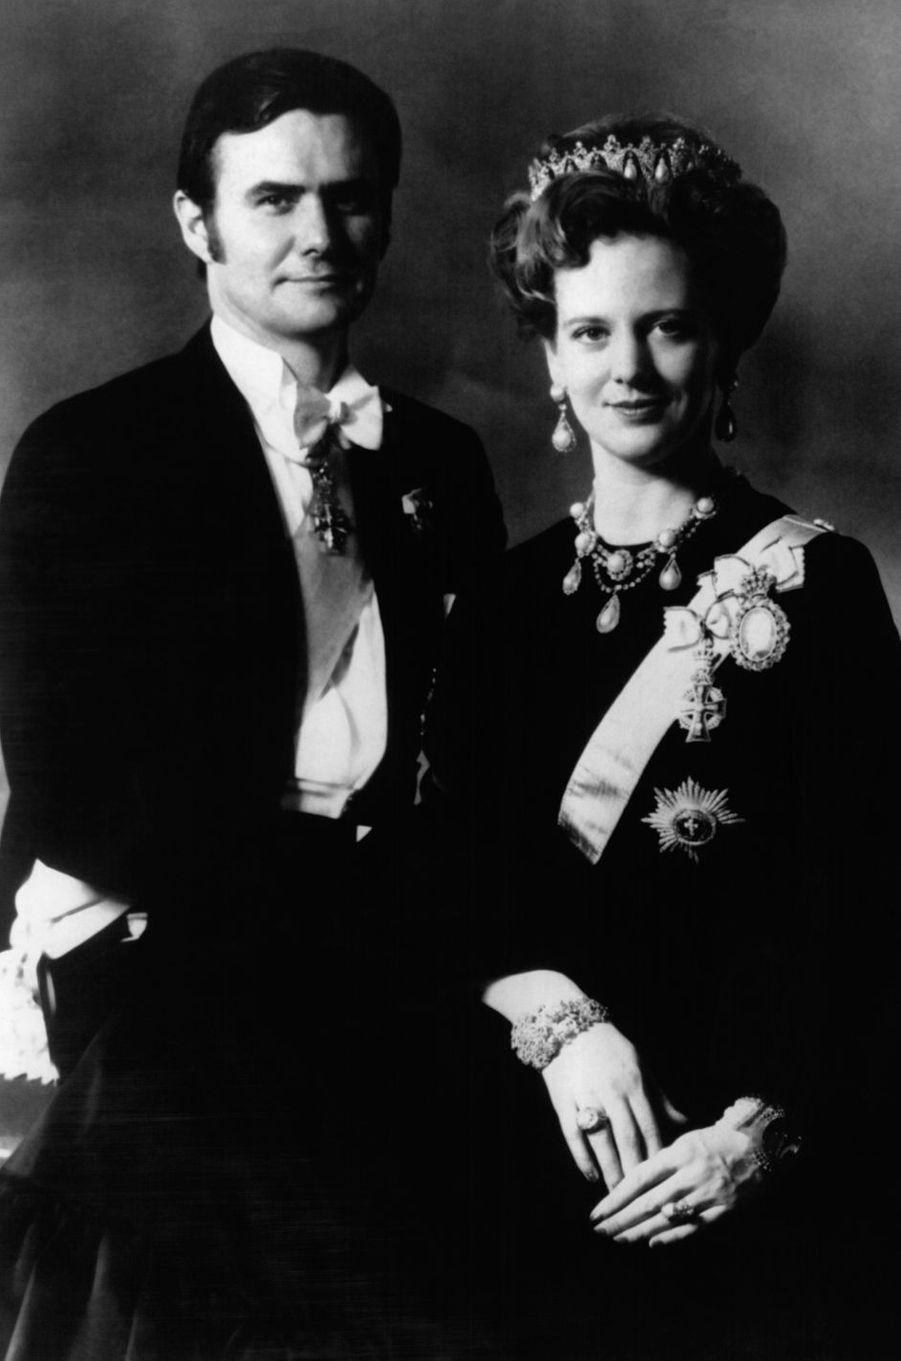 Le prince Henrik de Danemark avec la reine Margrethe II, le 16 mars 1972